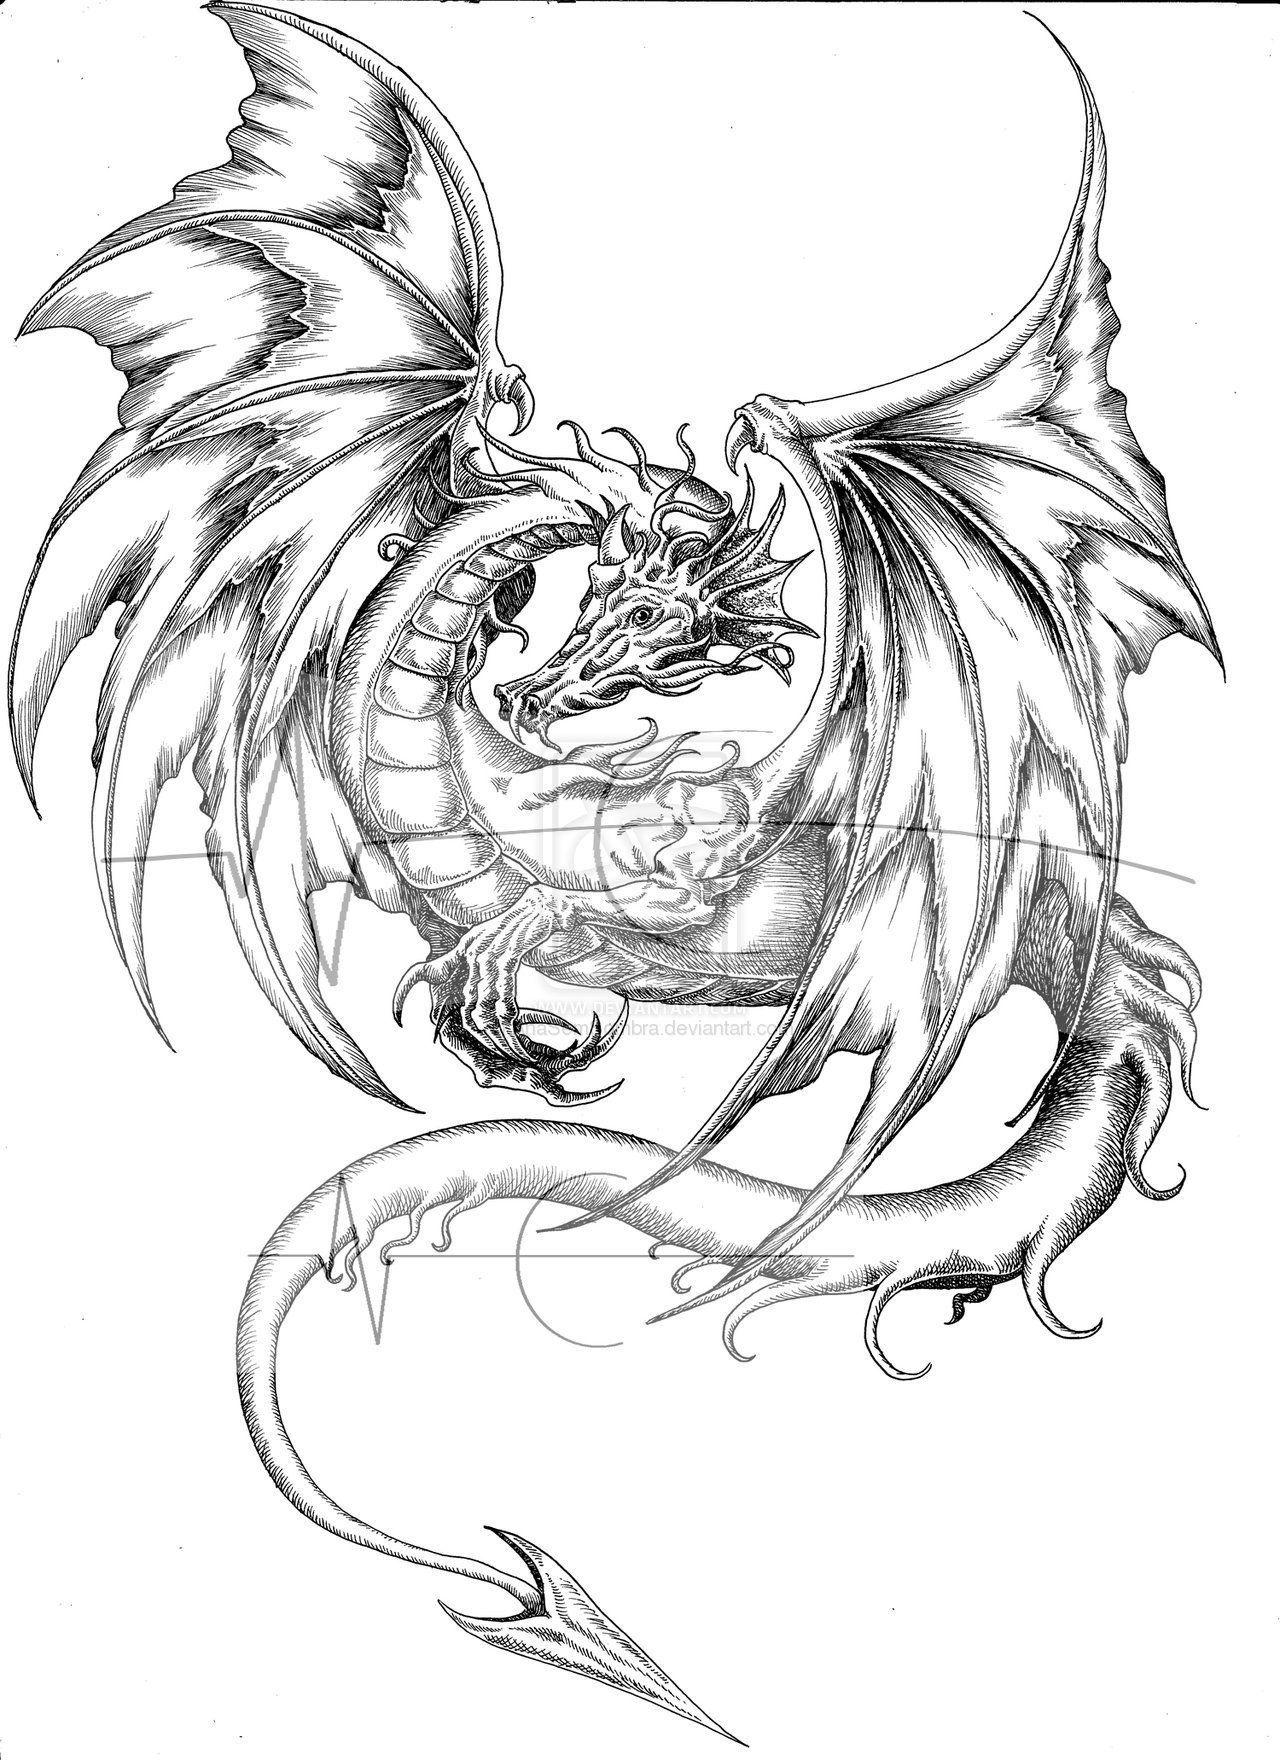 Chinese Dragon Coloring Pages Elegant Coloring Books Free Printable Chinese Drag Chinese D Drachenzeichnungen Drachentattoo Chinesische Drachen Zeichnung